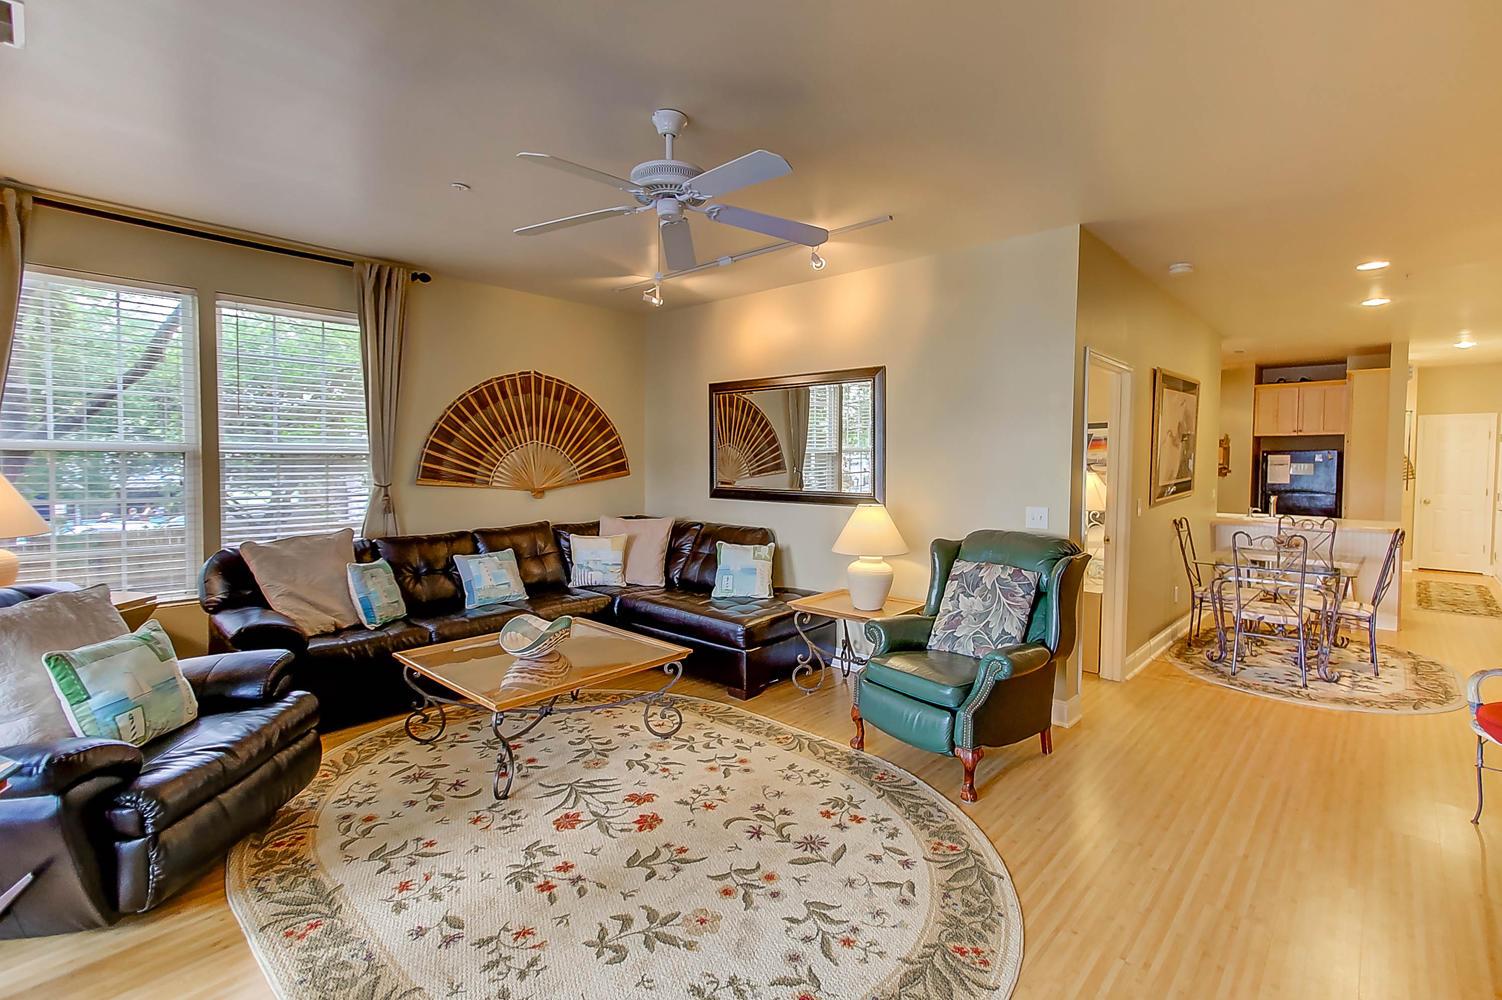 Beachwalker Villas Homes For Sale - 108 Ashley, Folly Beach, SC - 19